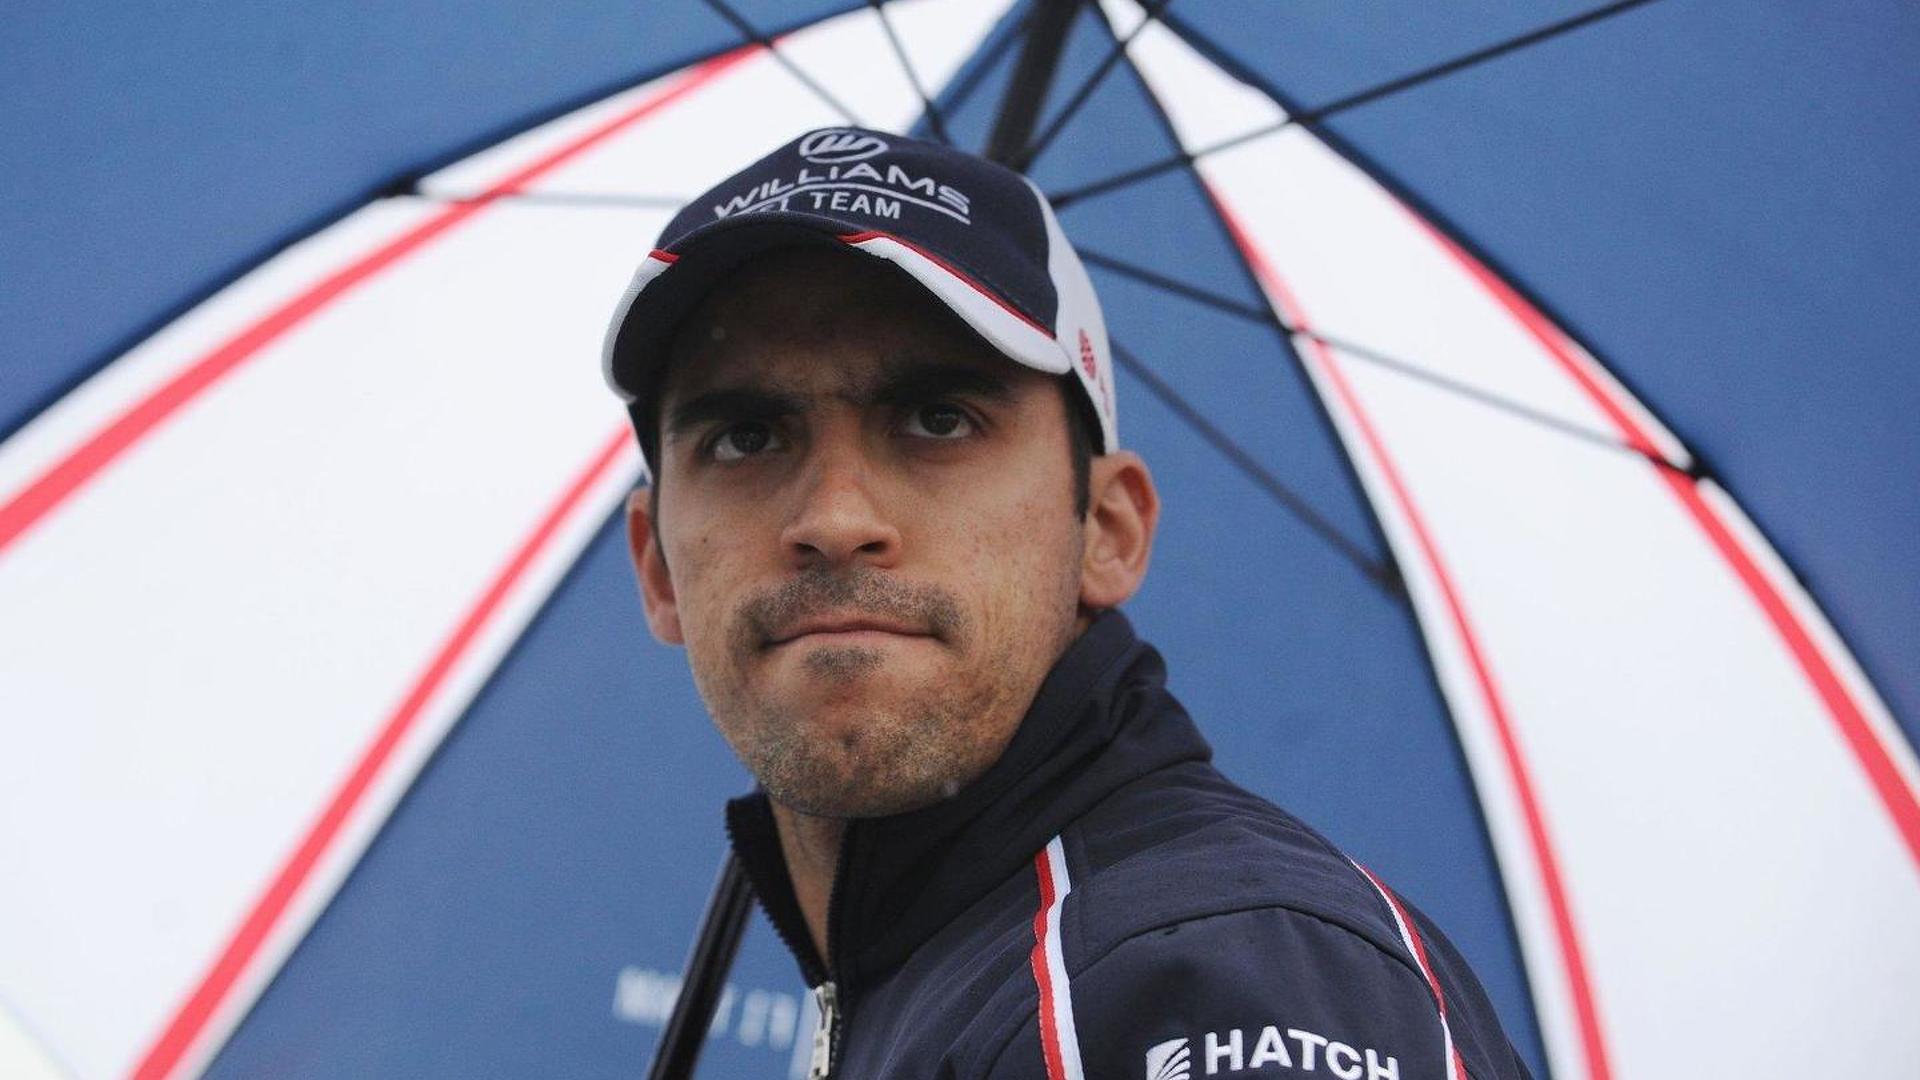 'Any change' good for struggling Williams - Maldonado